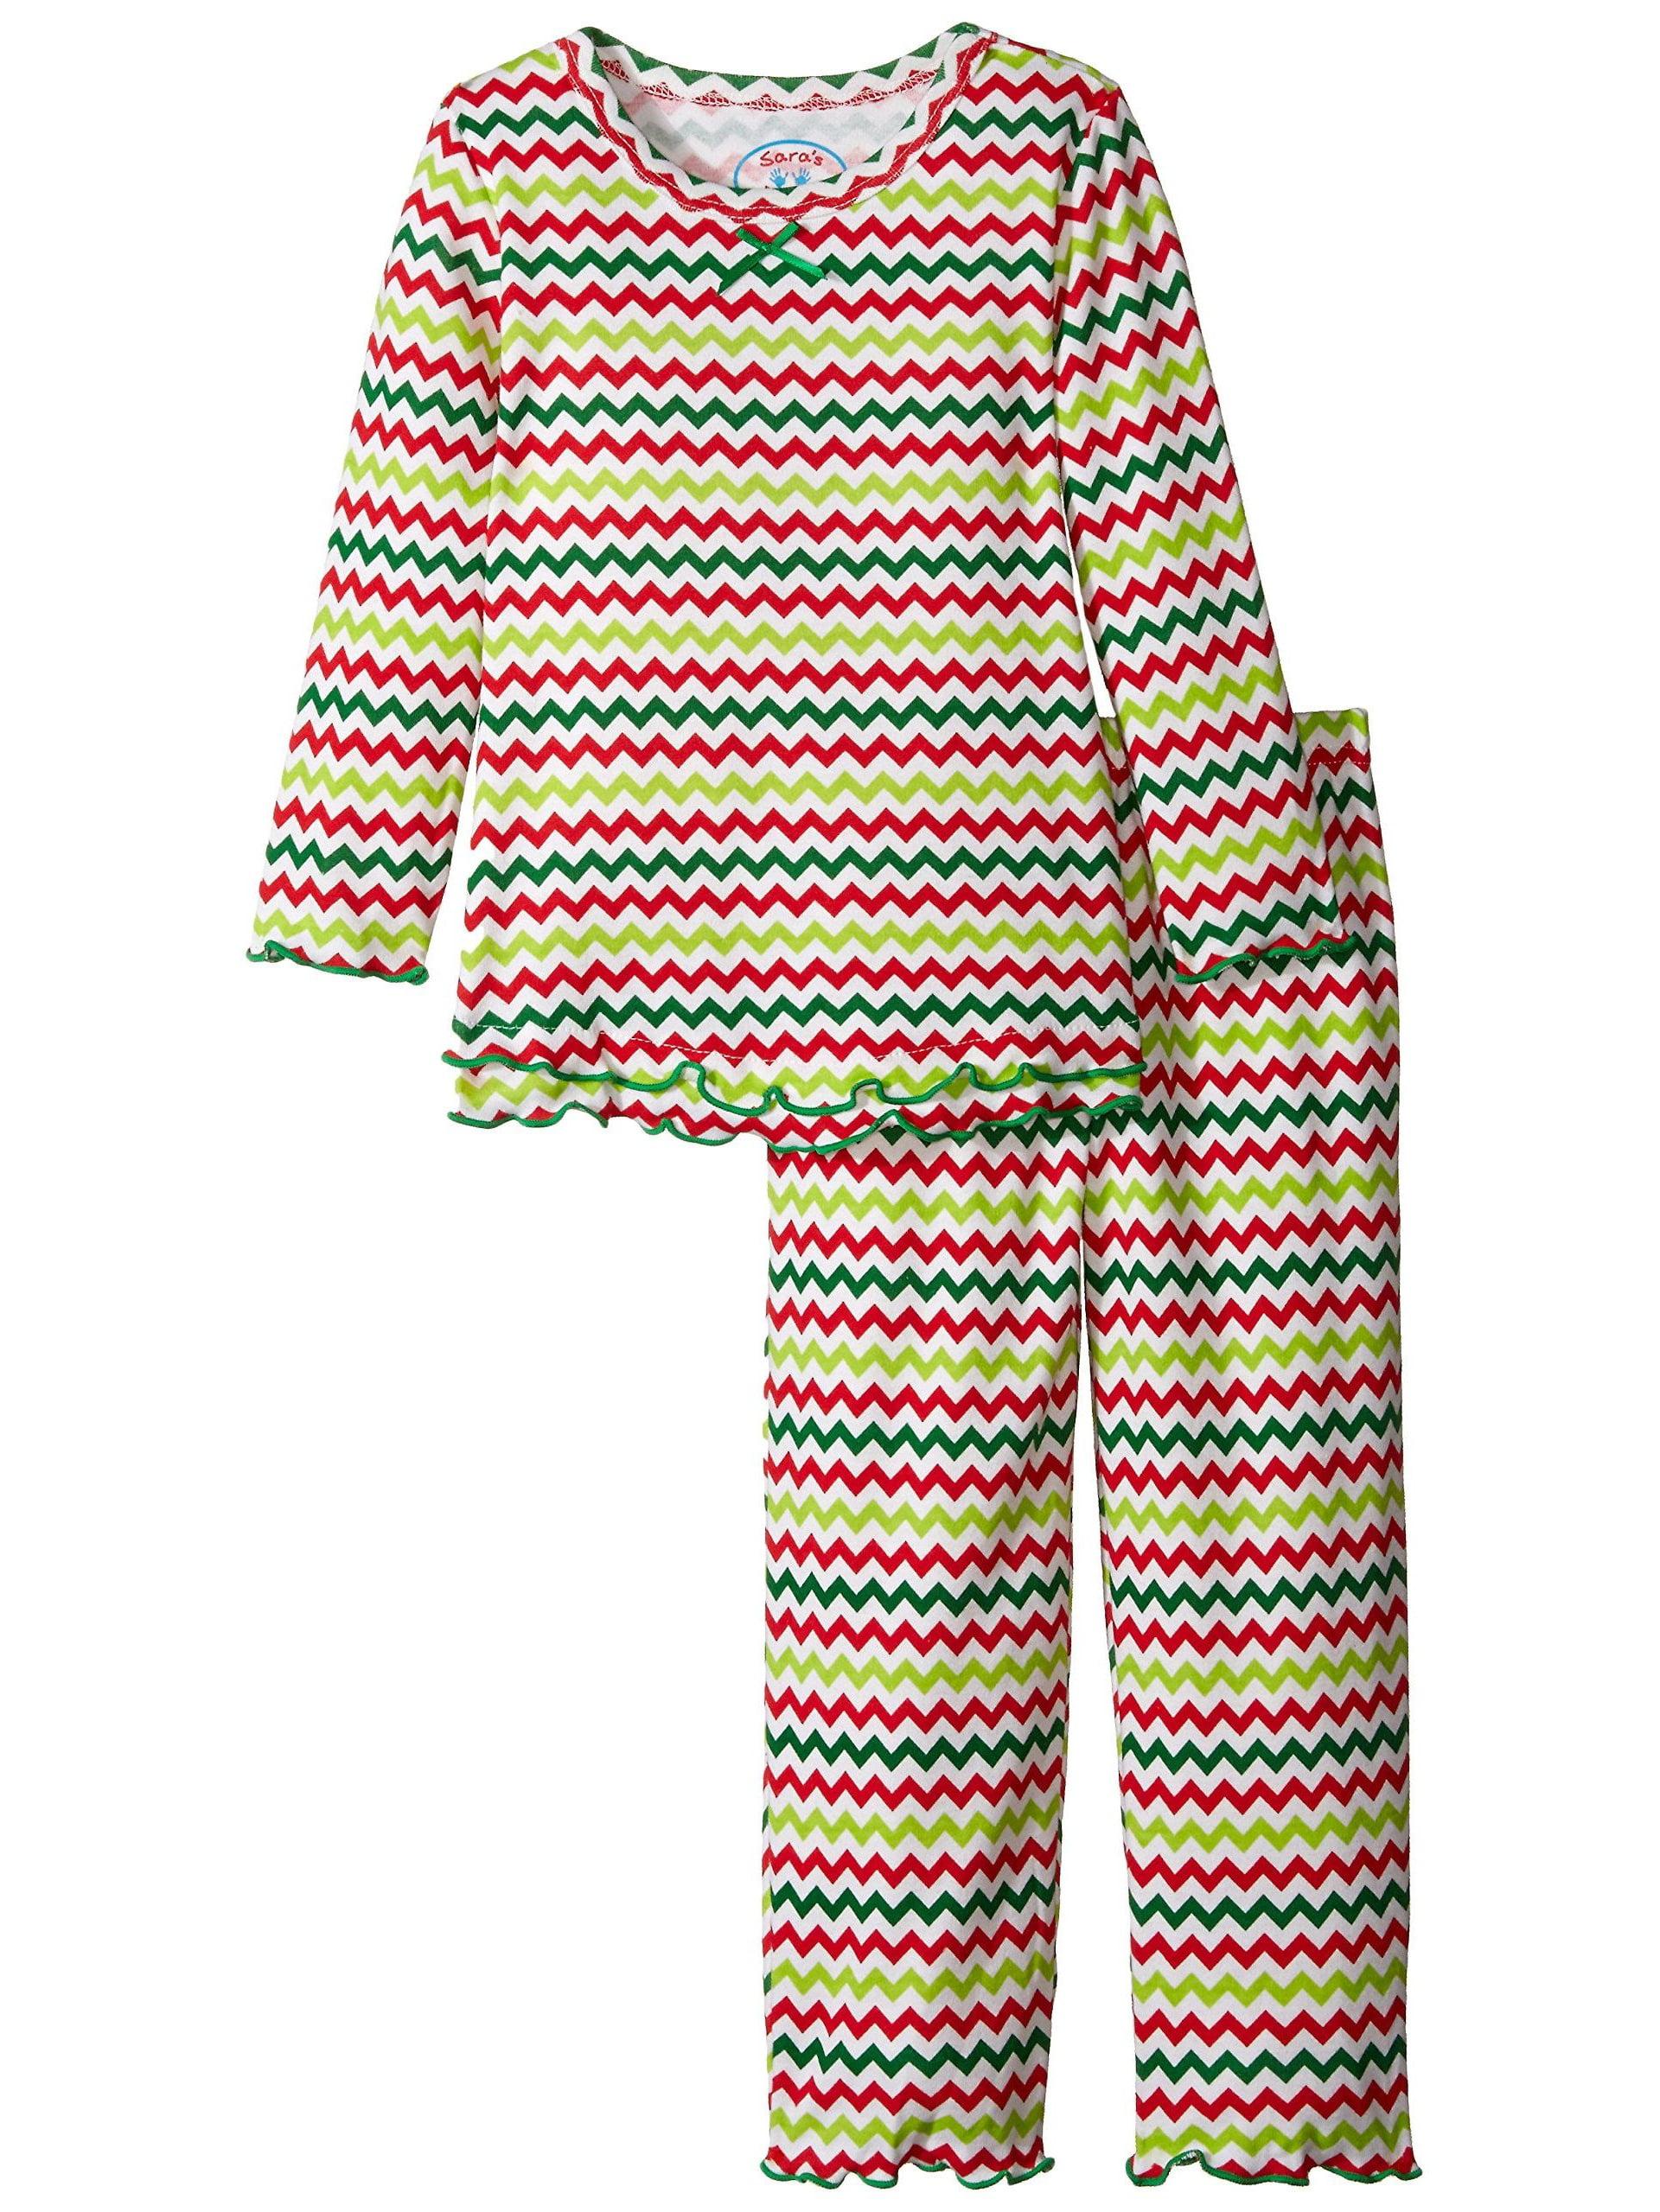 Saras Prints Girls Pink Ruffle Top /& Pant Pajama Set Kids Size 14